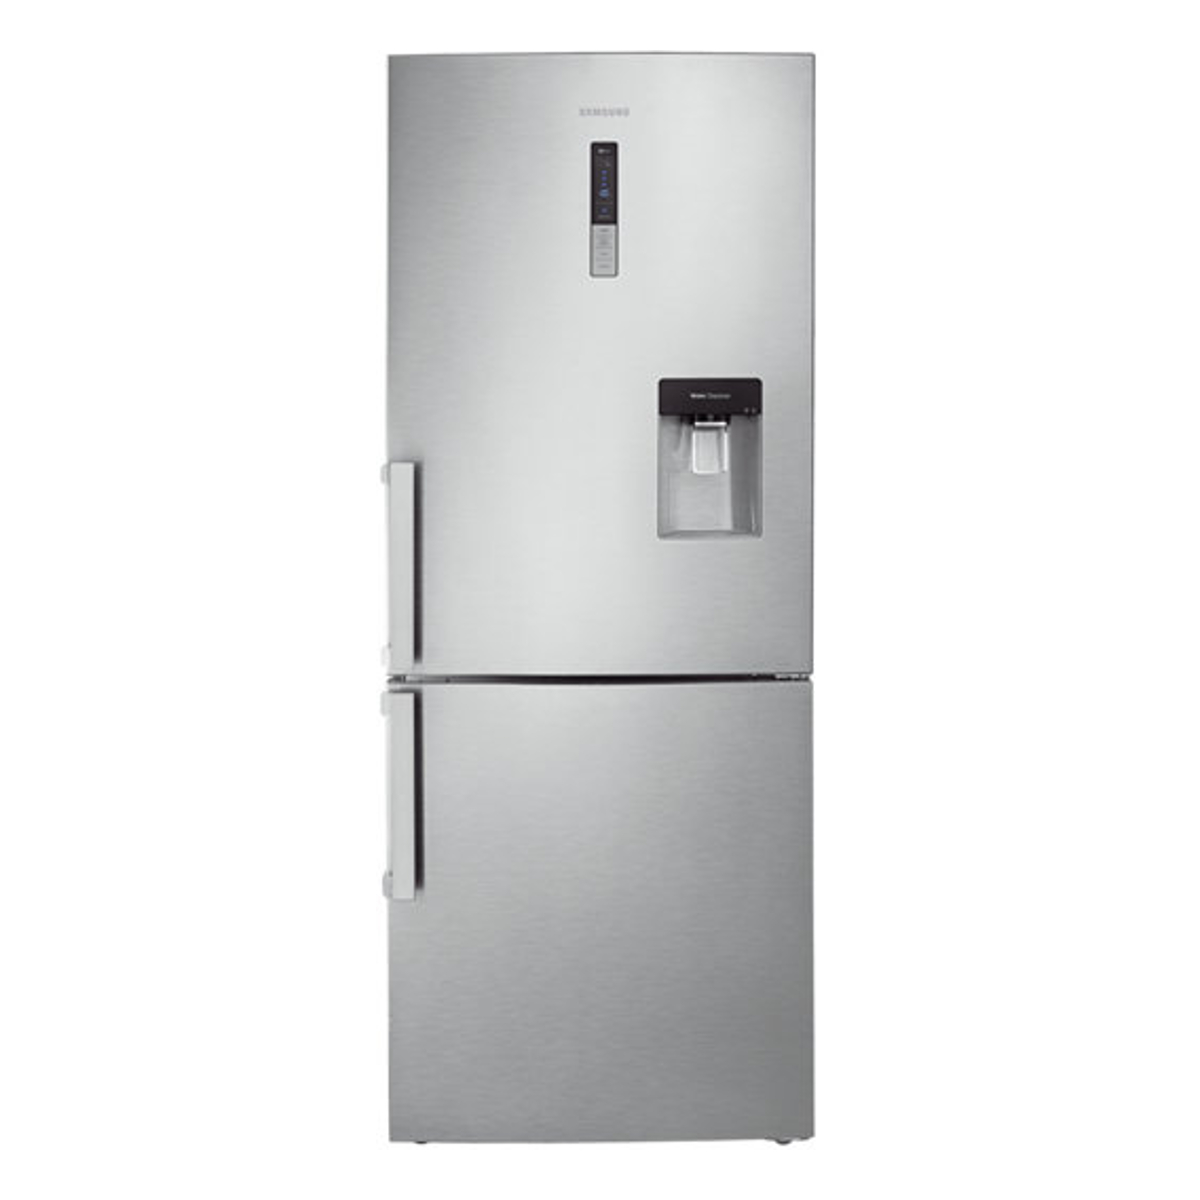 Samsung Rl4362fbasl Fridge Freezer With Water Dispenser